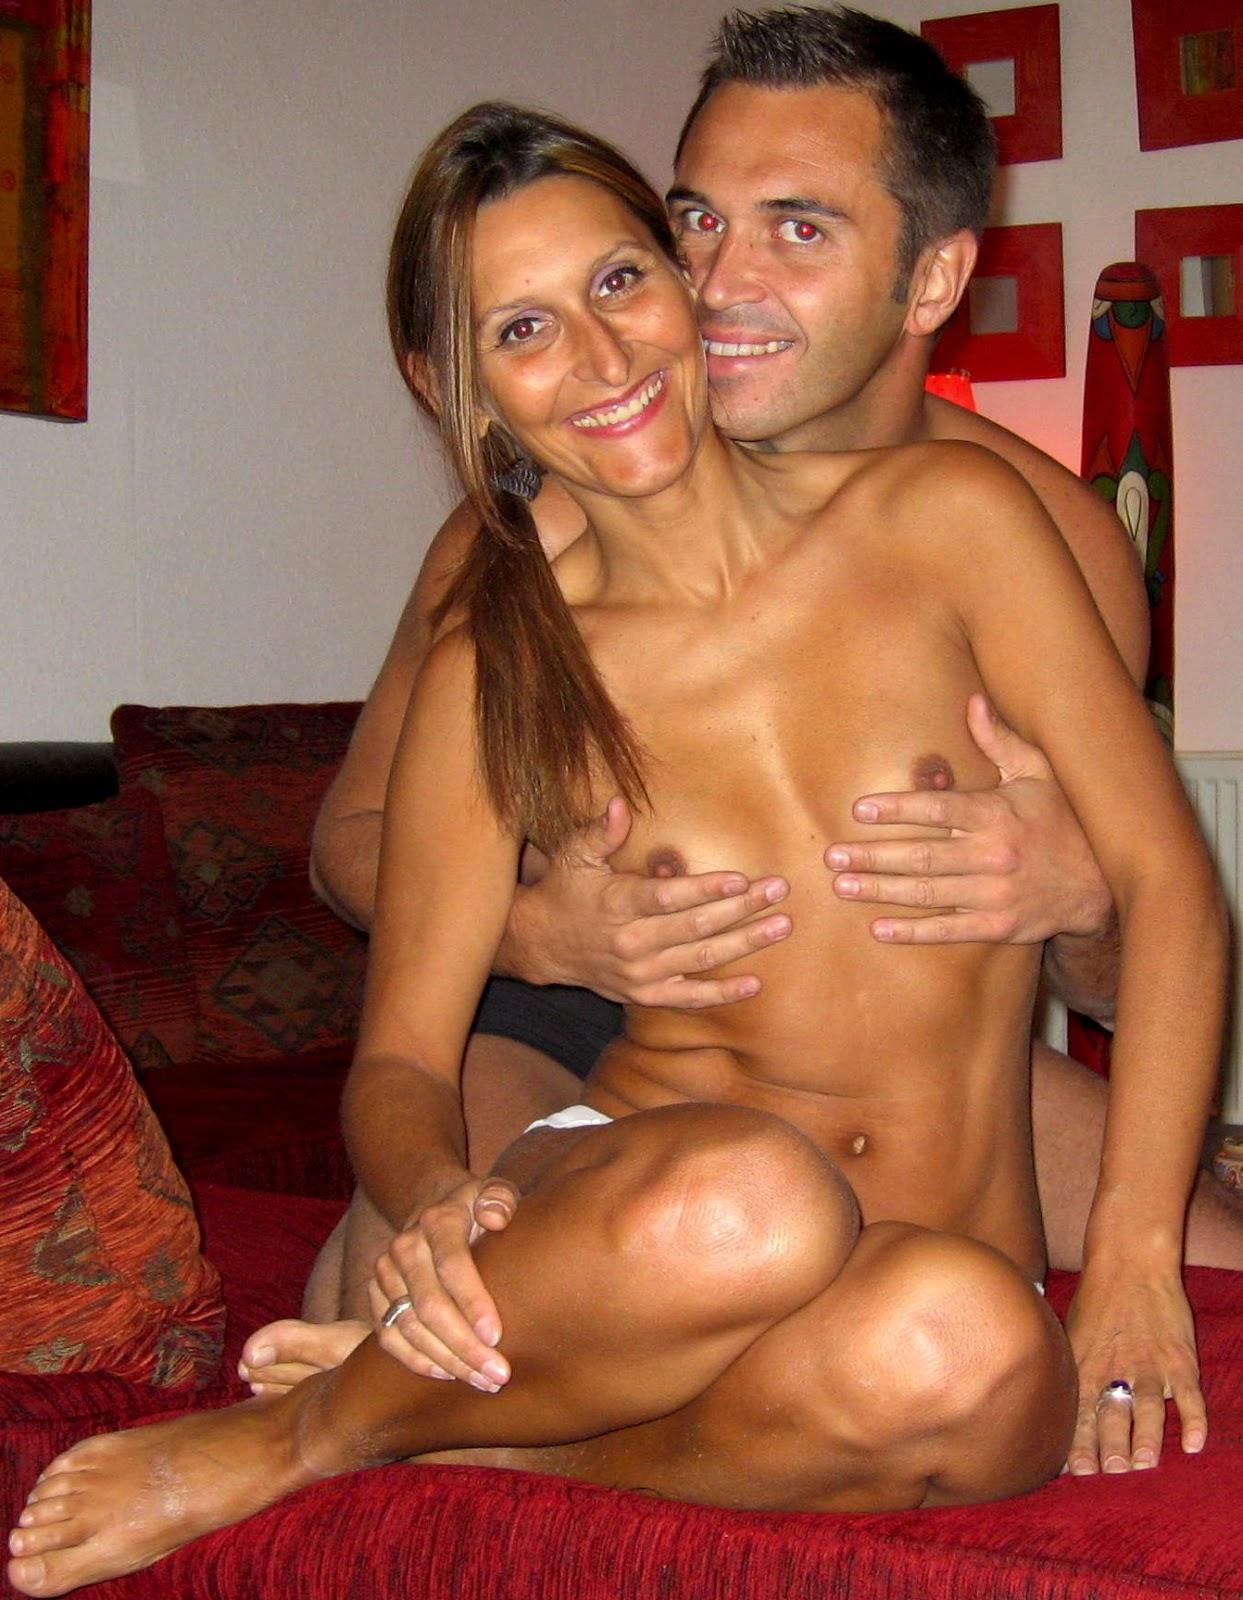 amy wersching nude photos